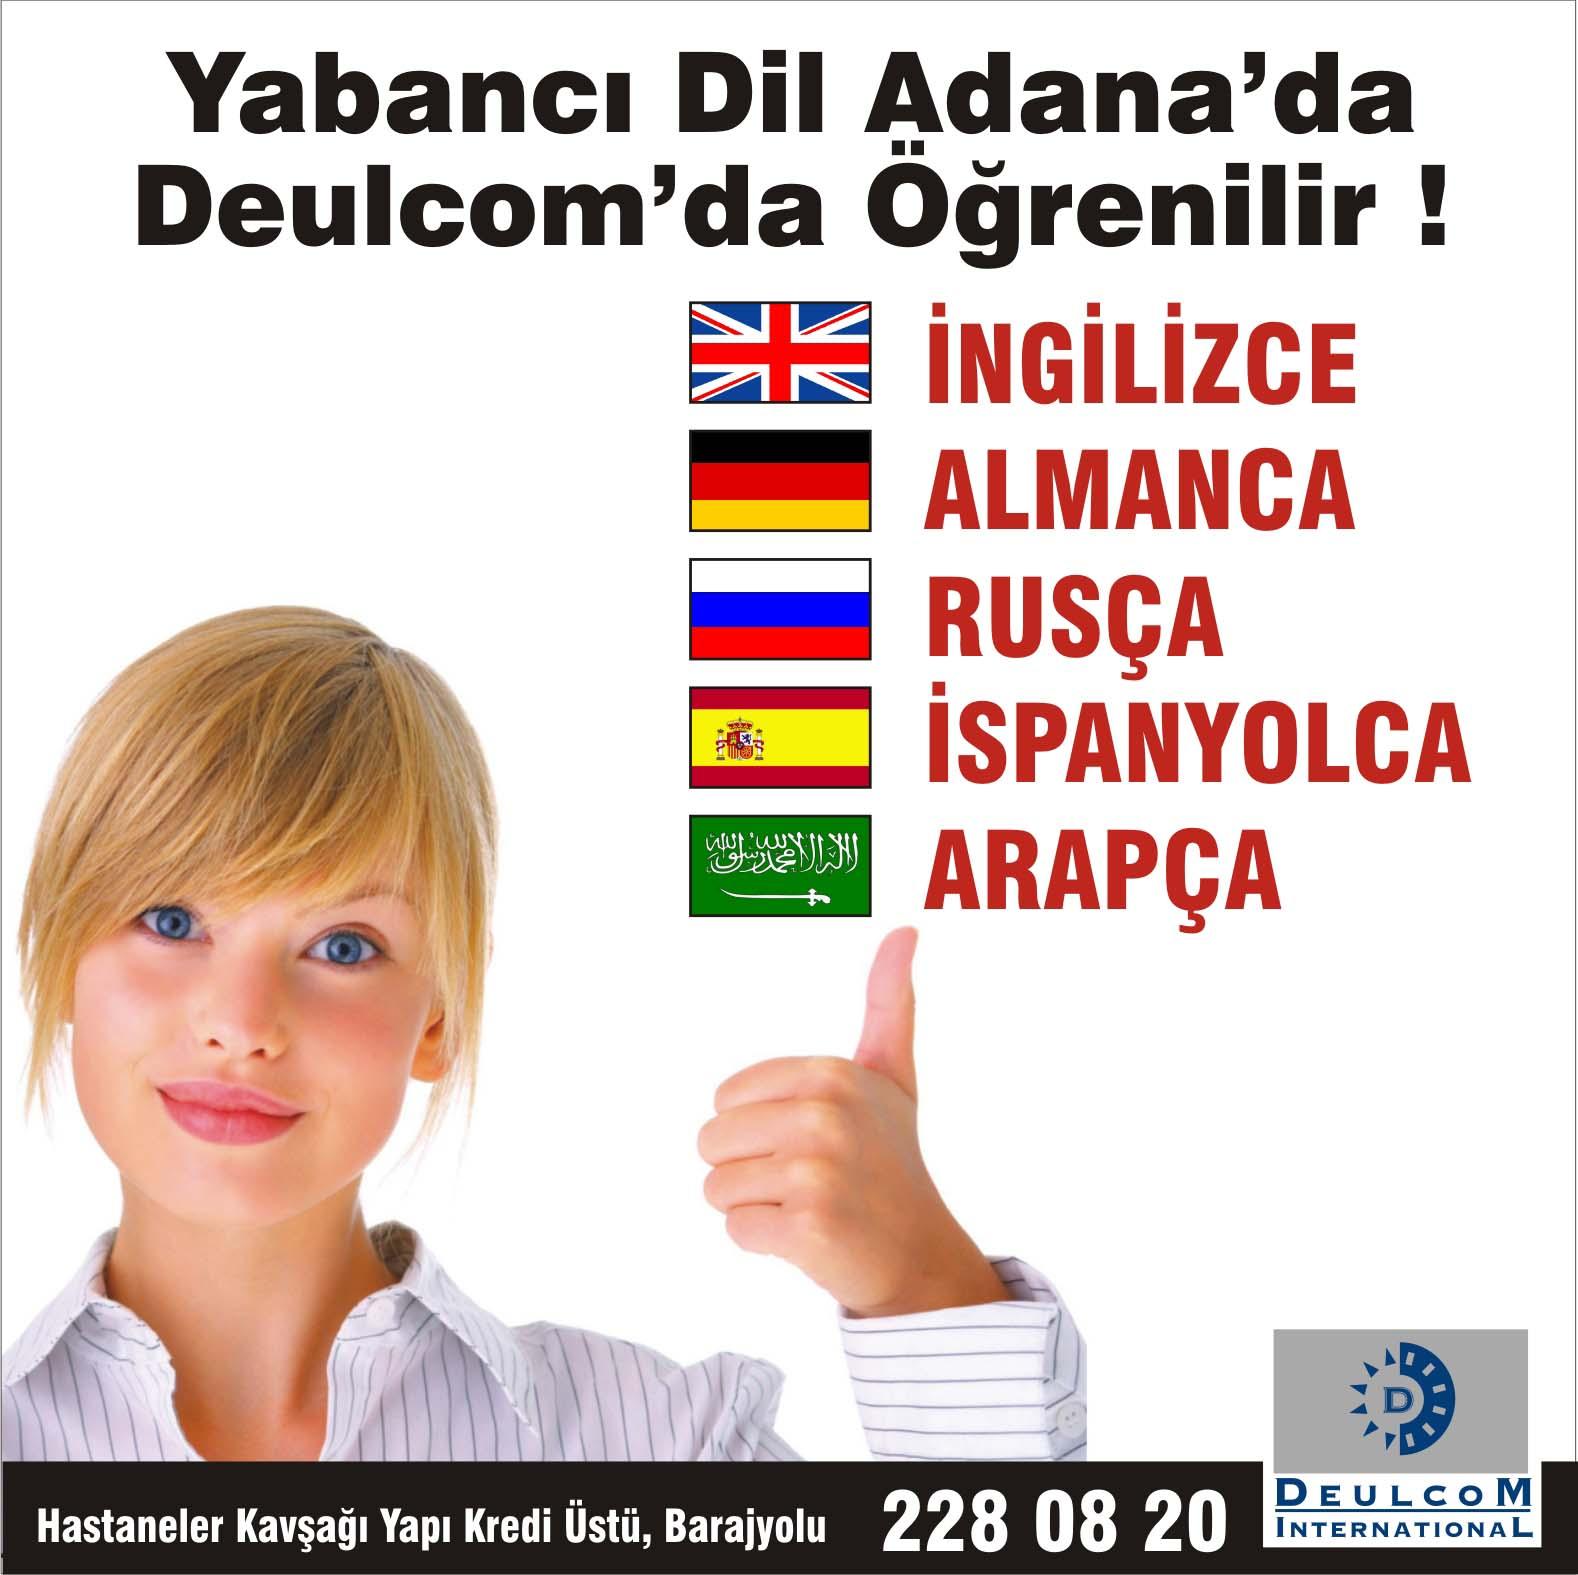 Deulcom